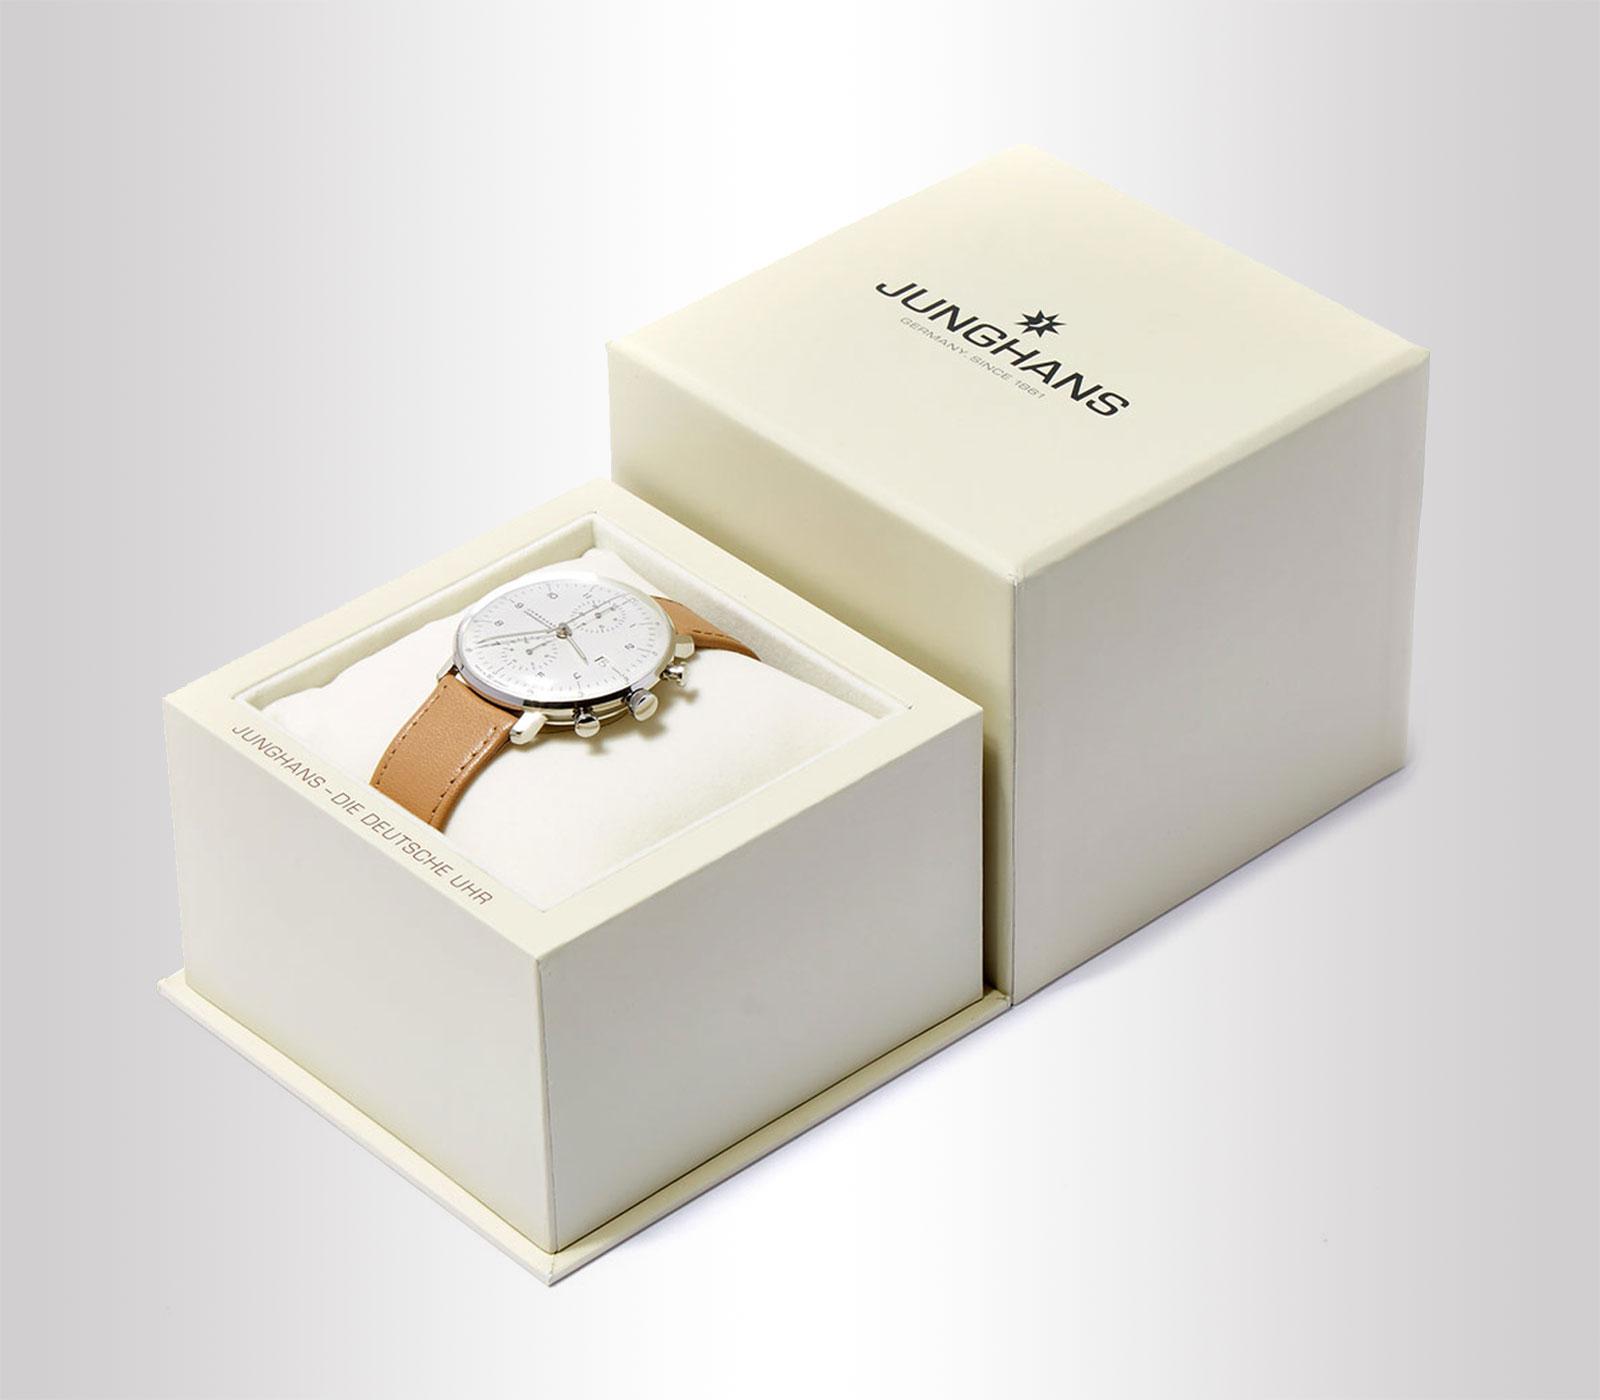 Confezione orologio Junghans